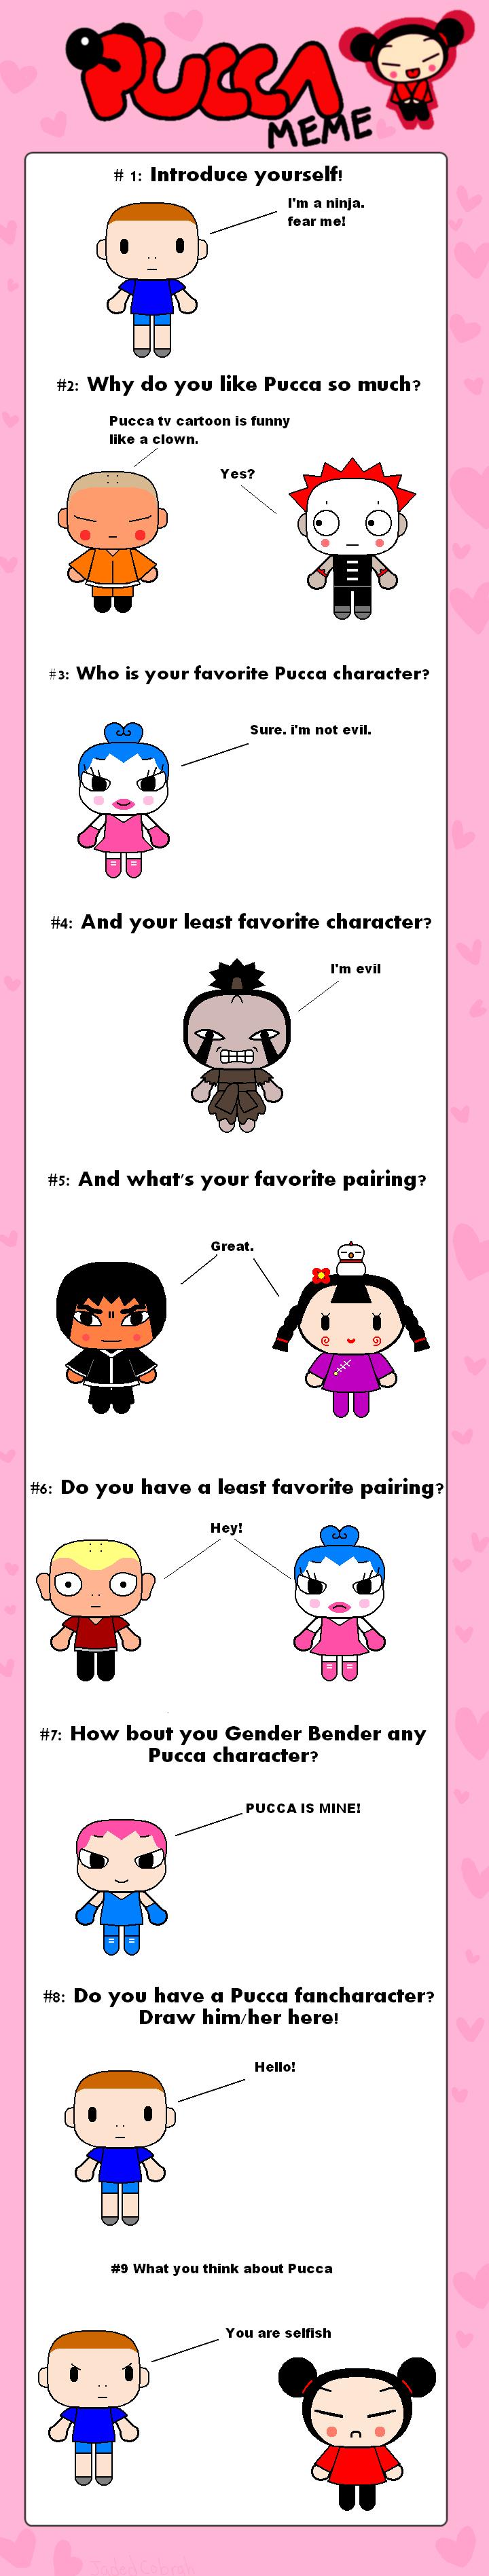 pucca and garu relationship memes